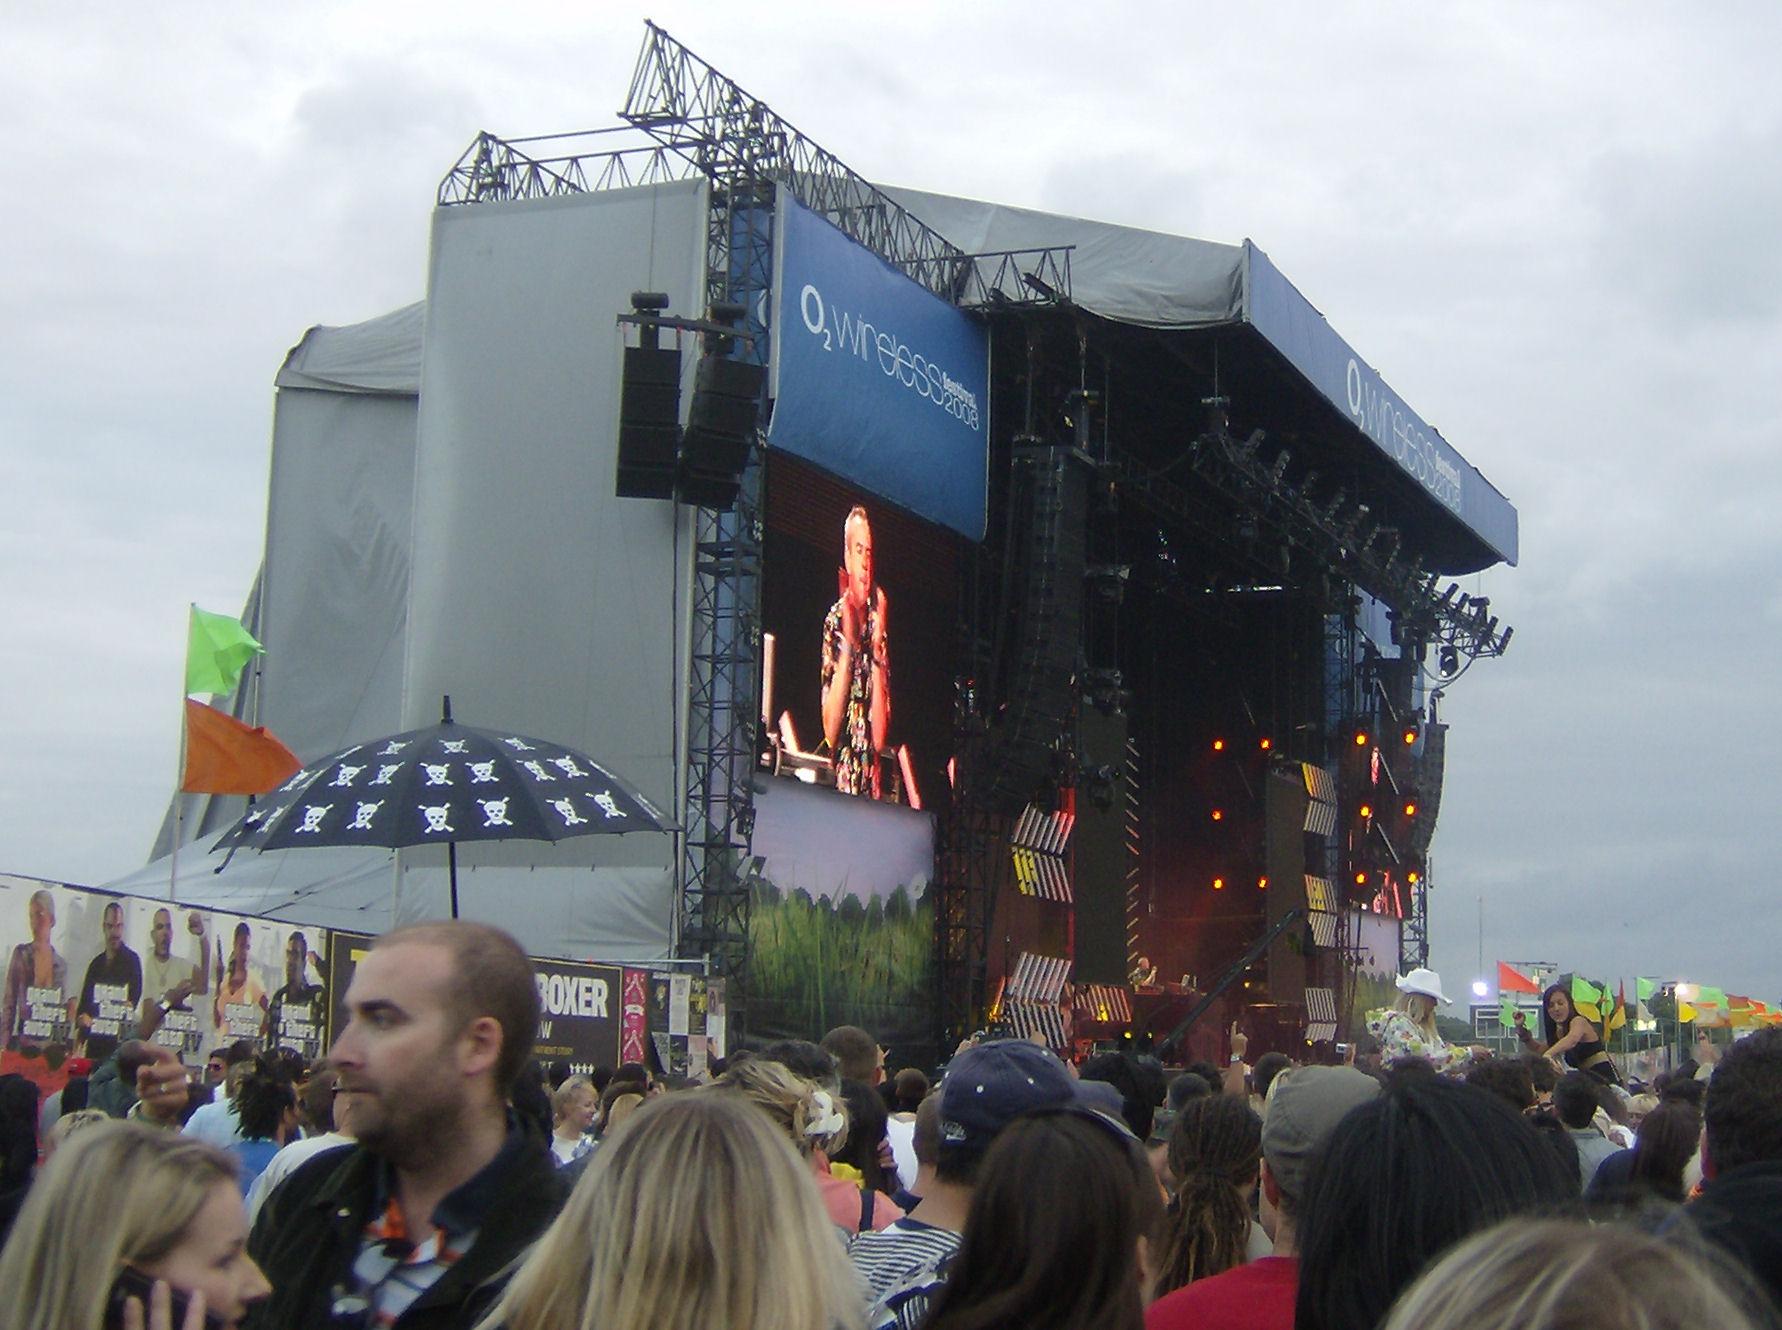 File Fatboy Slim At Wireless Festival 2008 Jpg